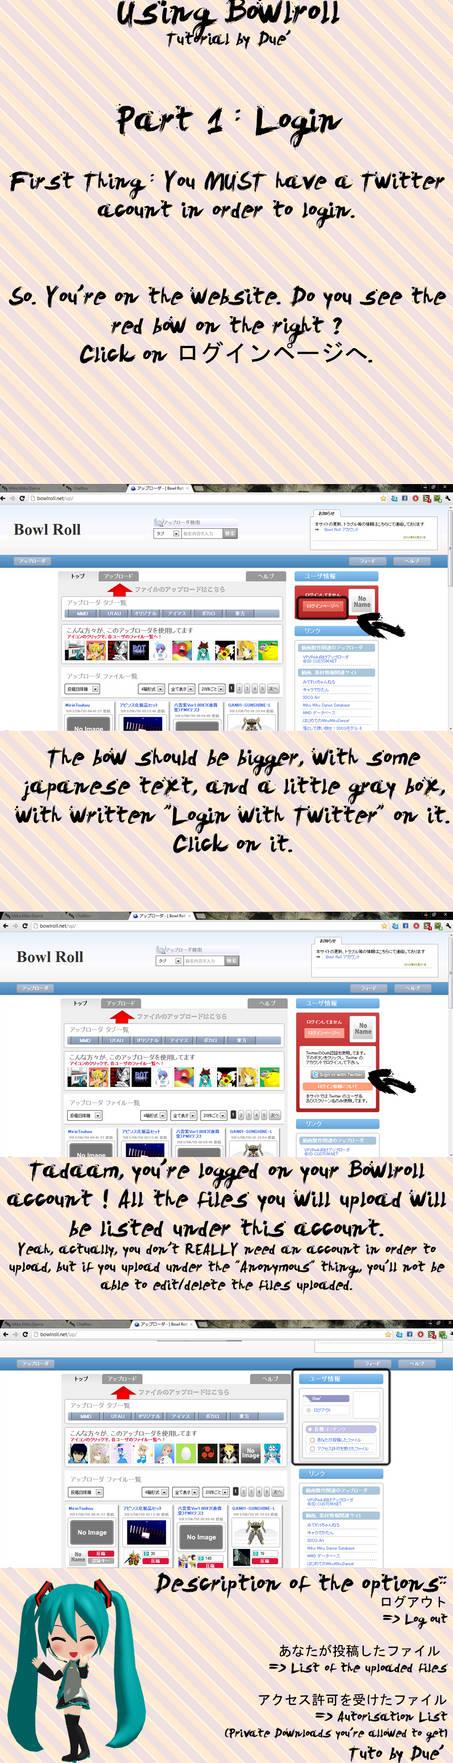 Using Bowlroll Login Tutorial By Duekko On Deviantart Submitted 1 year ago by sketiq. using bowlroll login tutorial by